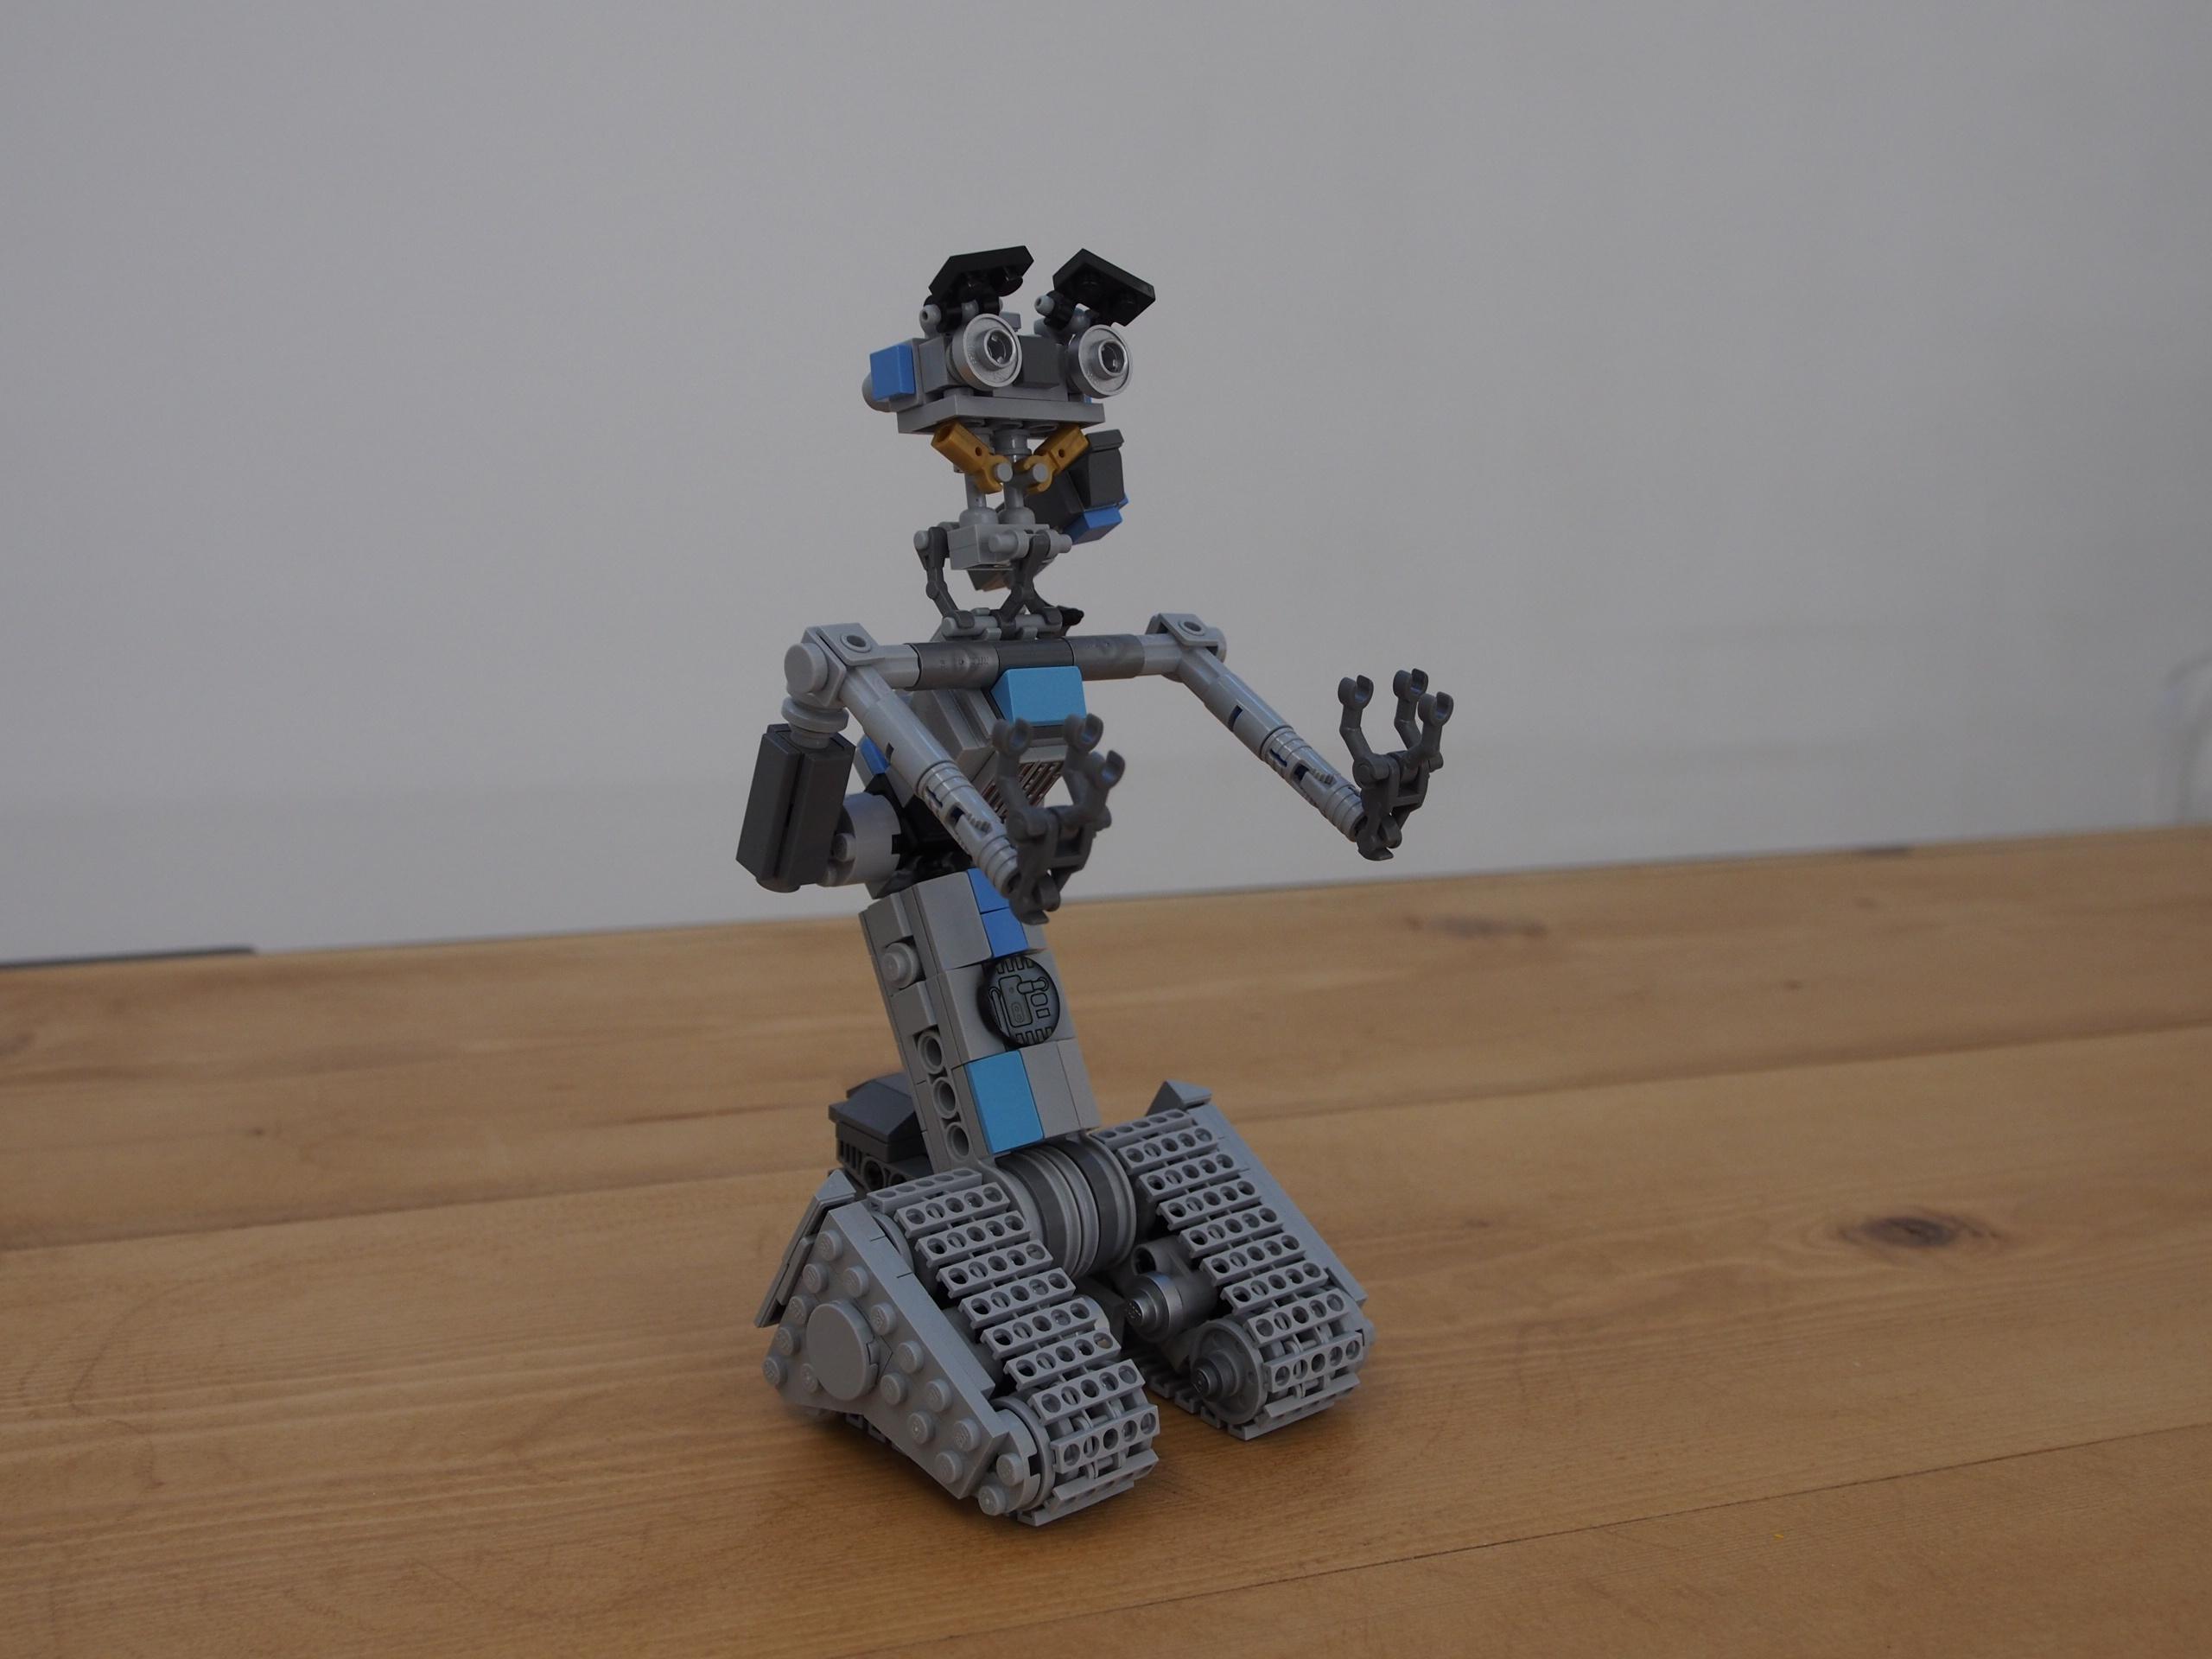 LEGO Johnny 5 Short Circuit Time Lapse